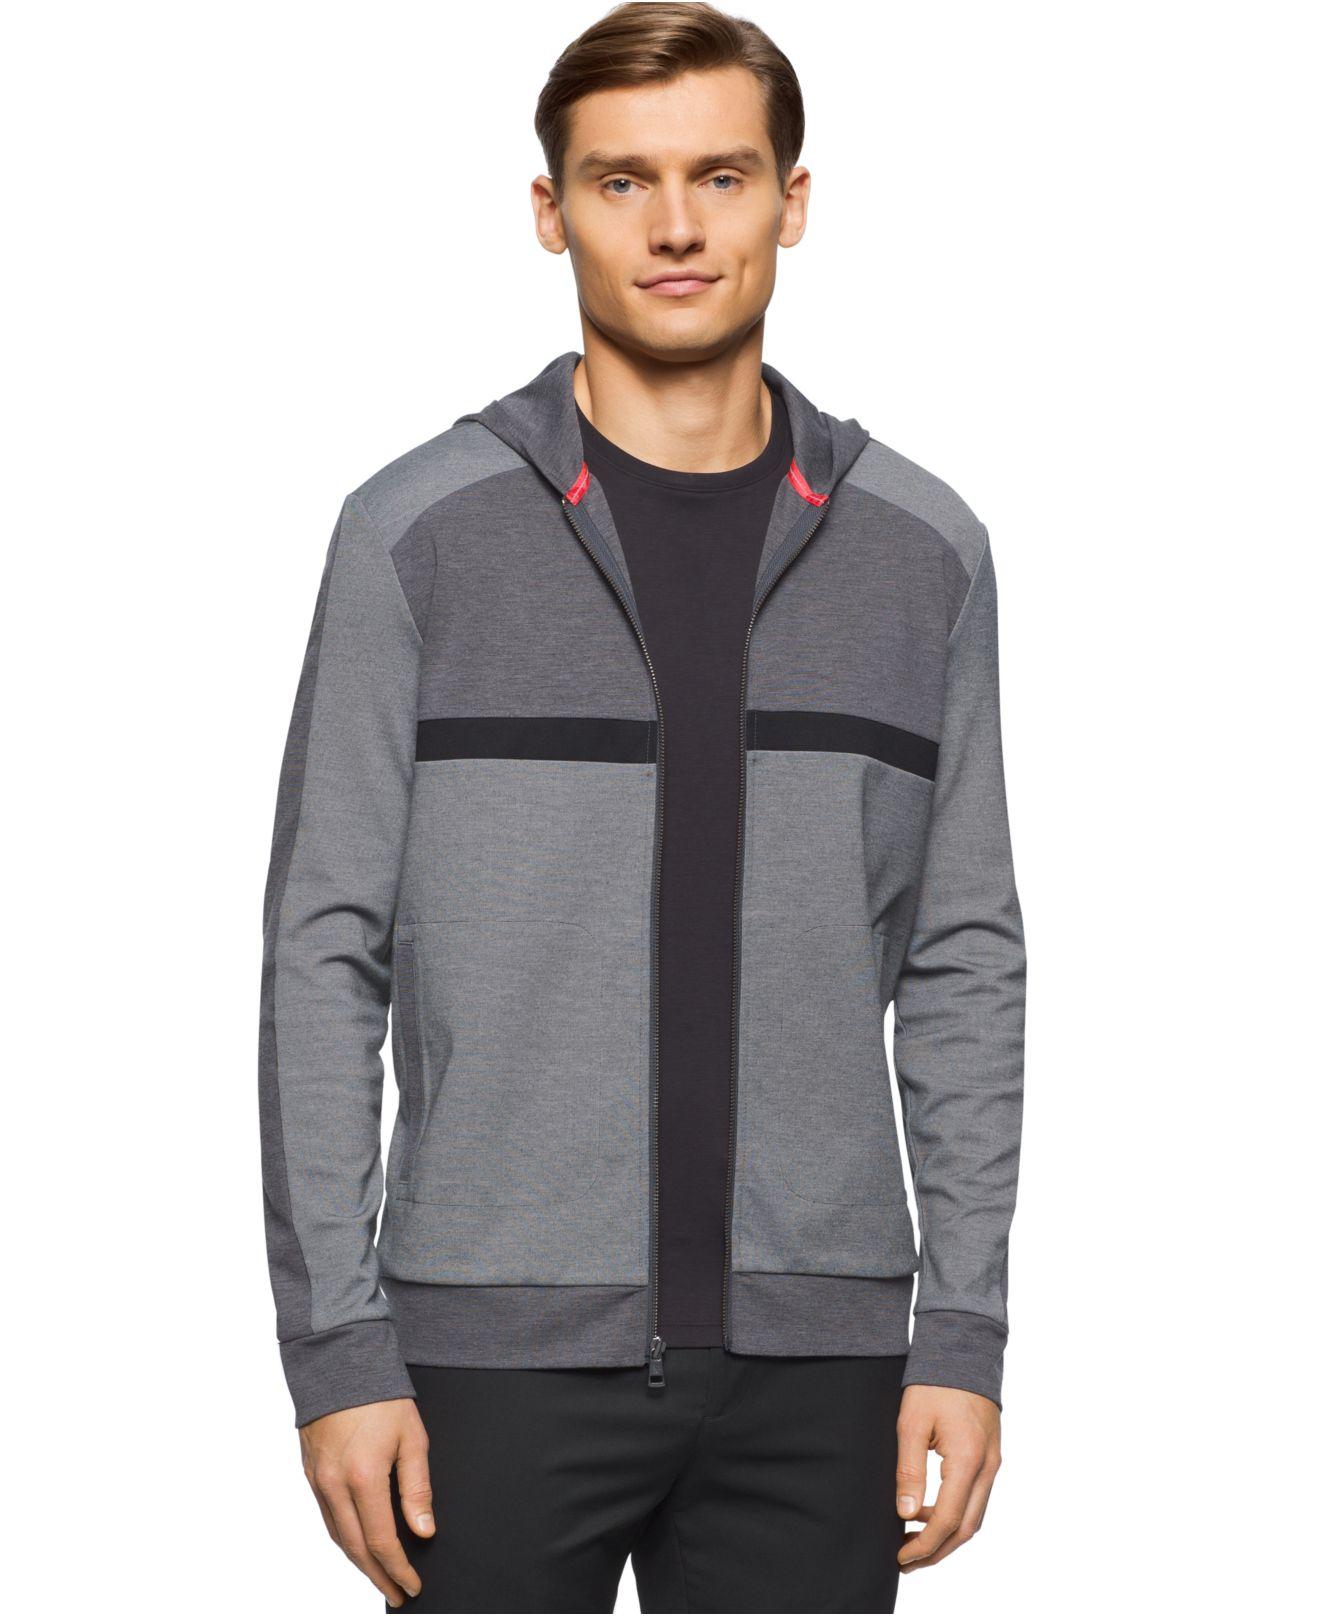 calvin klein men 39 s colorblocked hoodie sweatshirt in black for men lyst. Black Bedroom Furniture Sets. Home Design Ideas